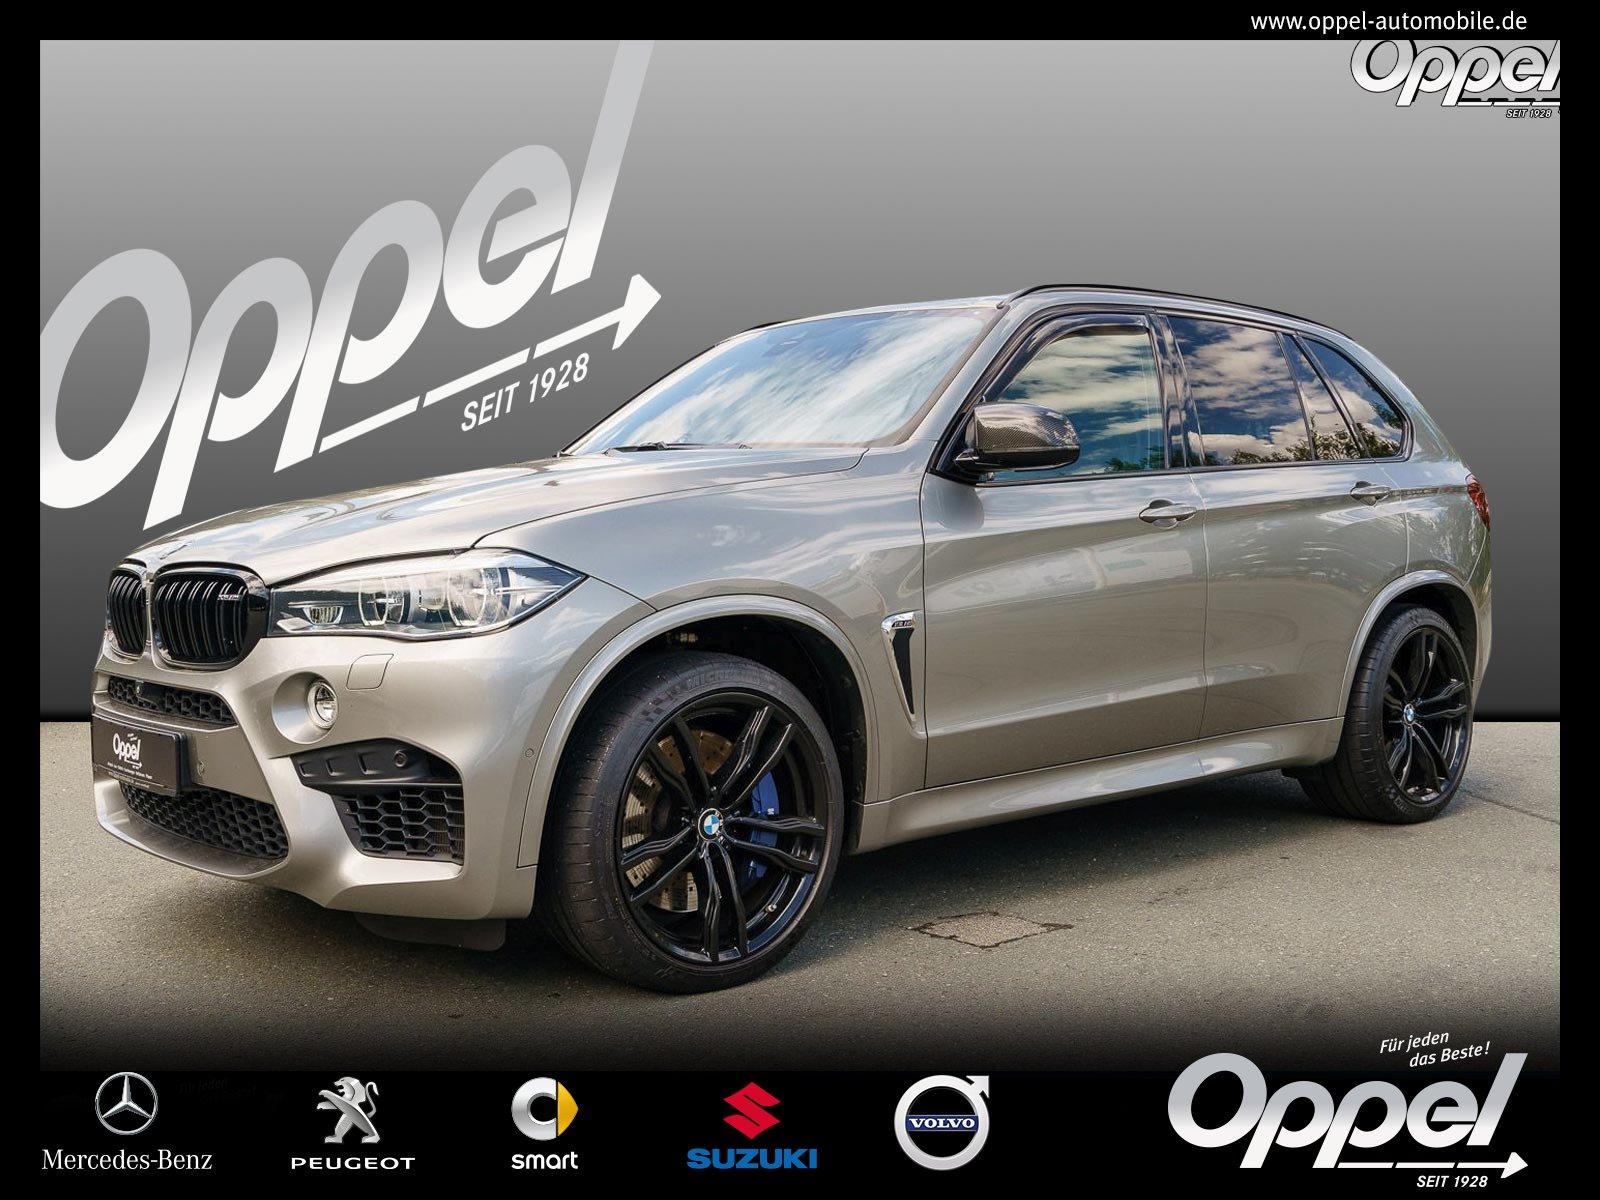 BMW X5 M AHK+Navi+EPH+Kamera+LM+SH+Standheizung+LED+, Jahr 2017, Benzin